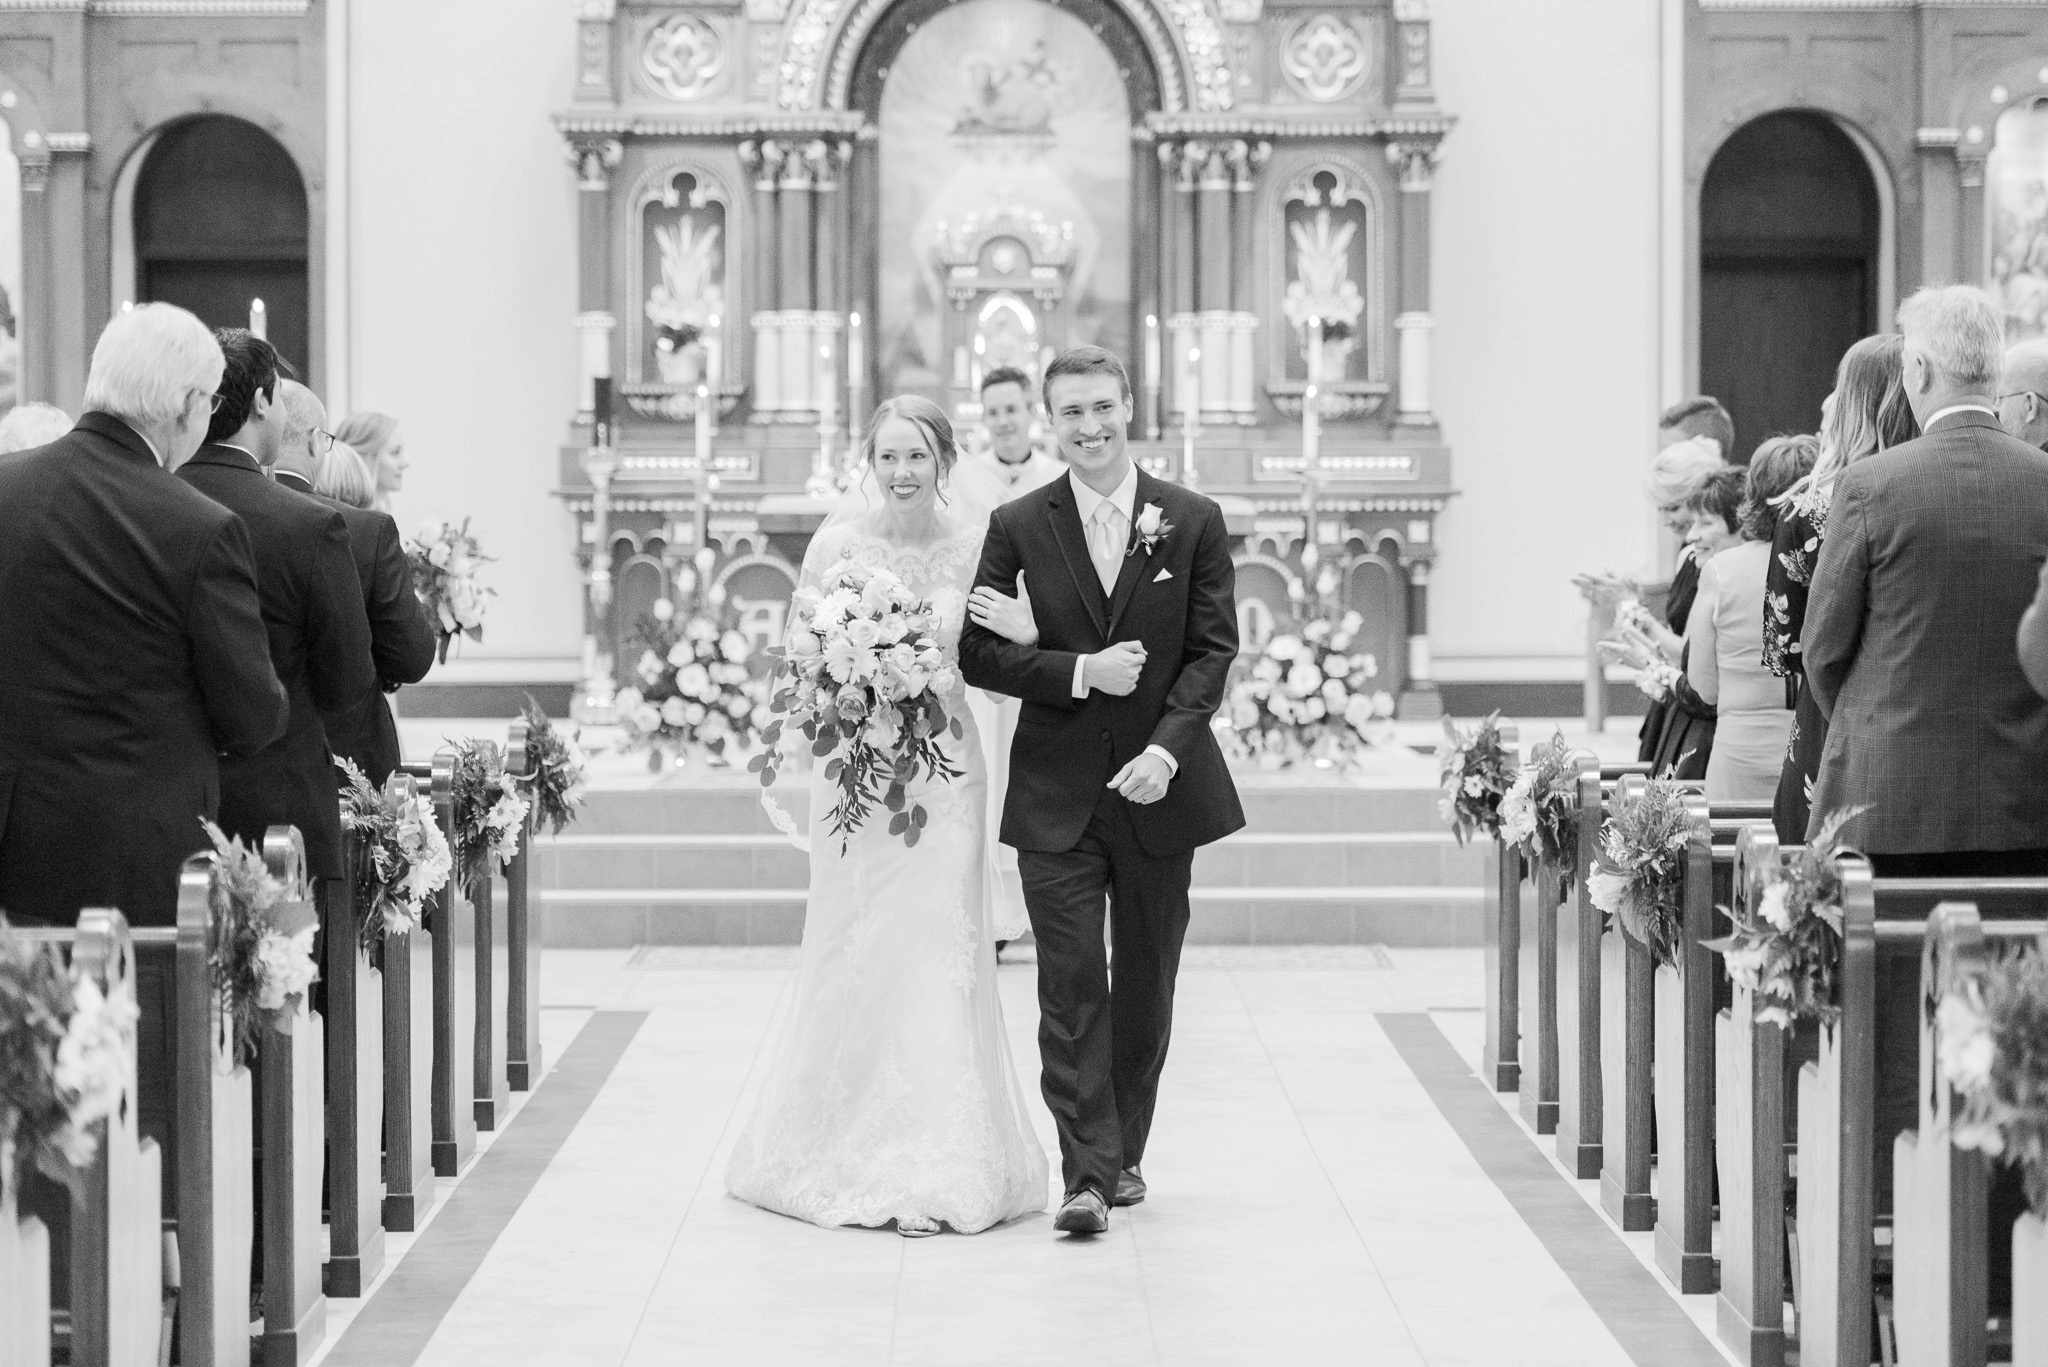 sunbury-ohio-wedding-hannah-johnathan_0031.jpg